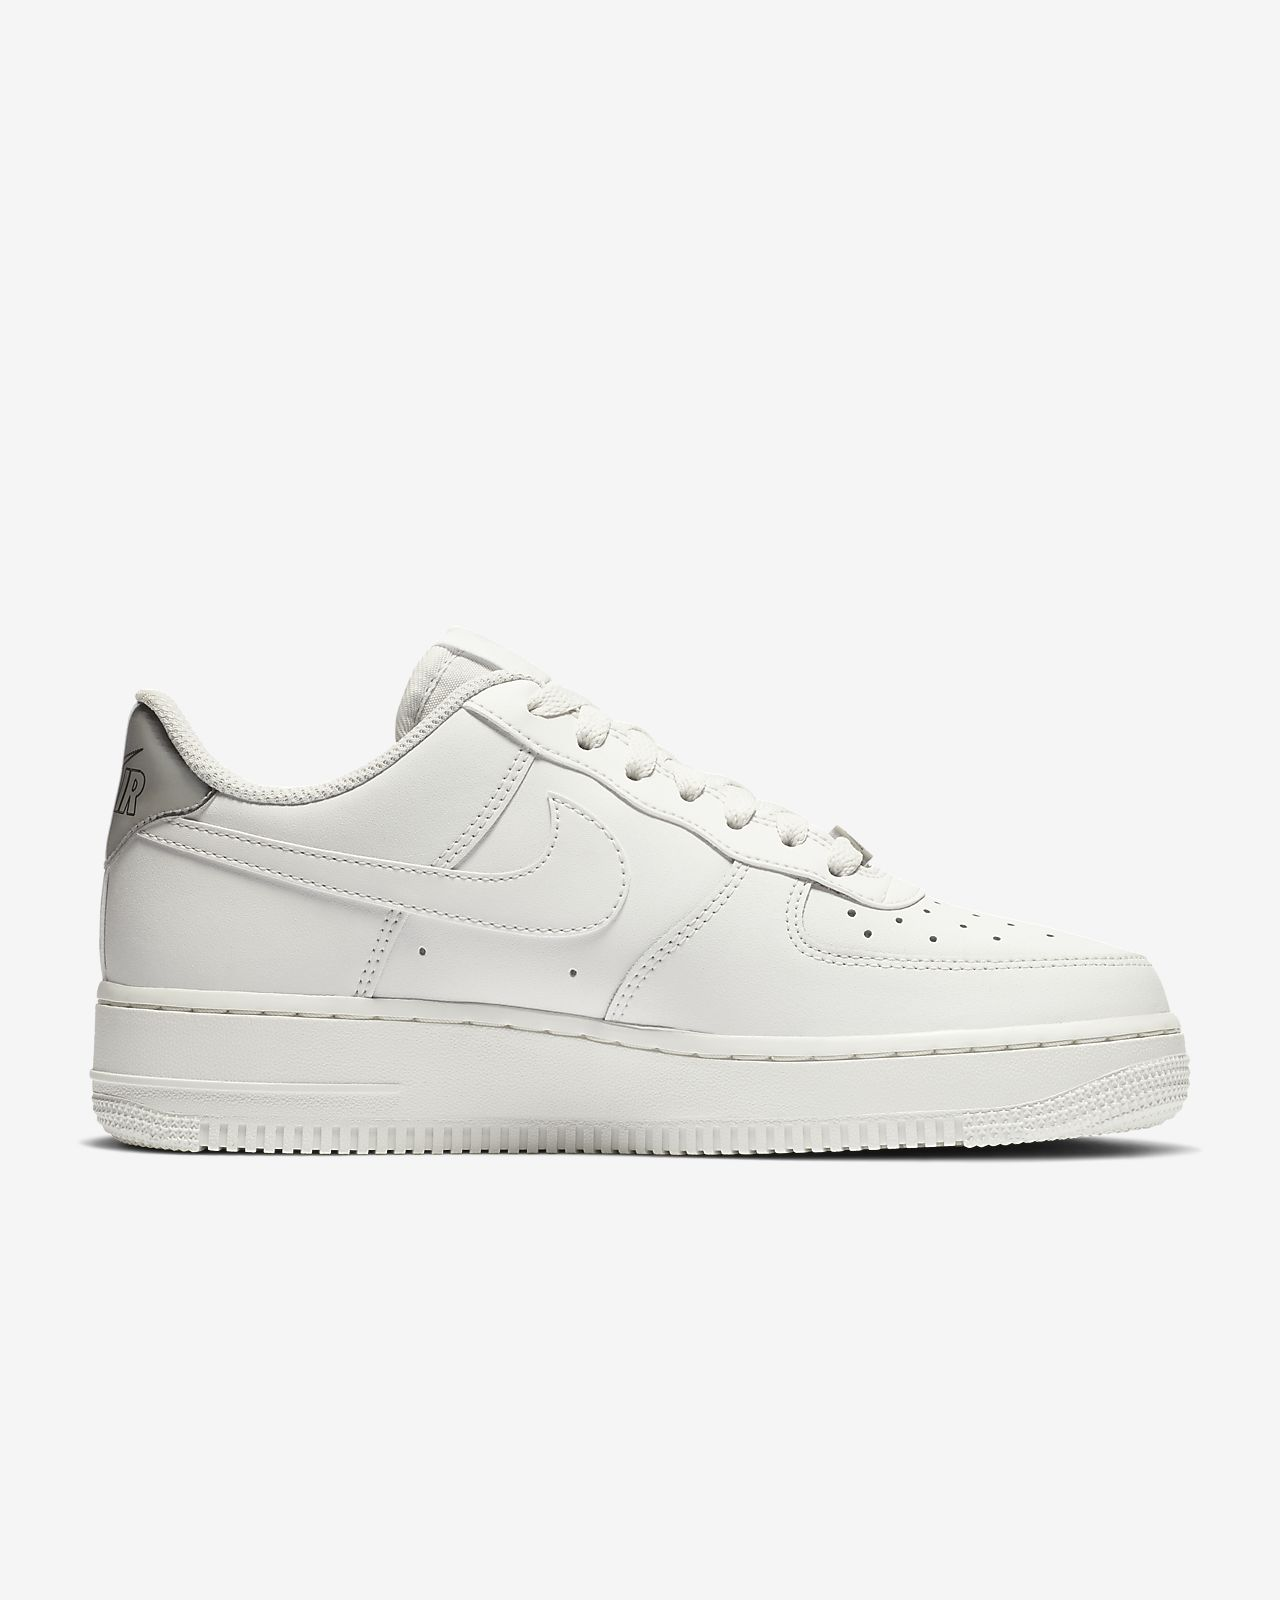 Nike Air Force 1 Essential 'Platitum' | CD9066 100